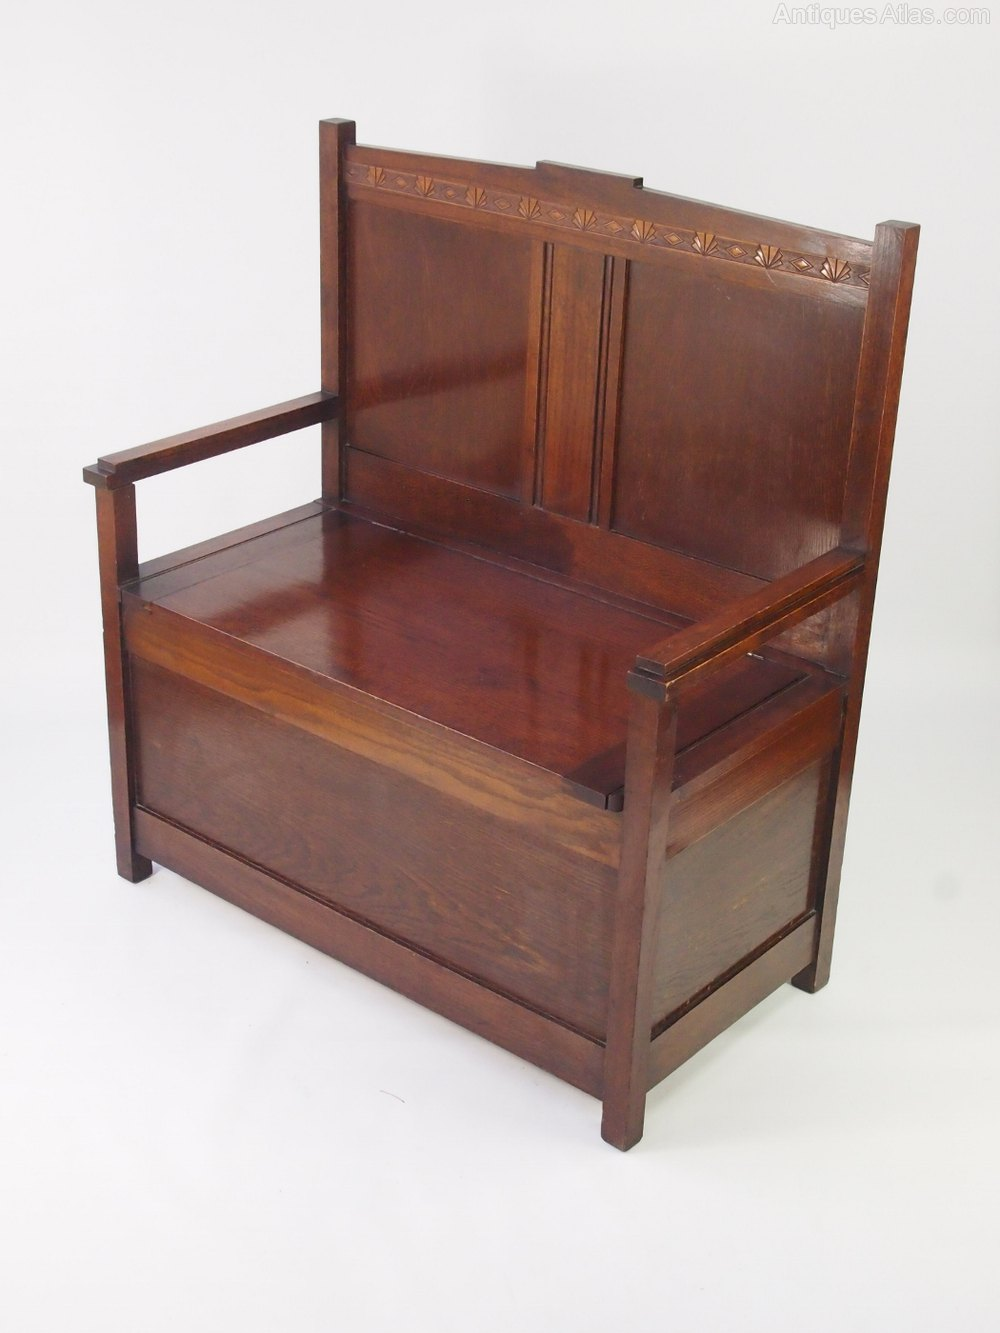 Small Art Deco Oak Box Settle Hall Bench Seat Antiques Atlas